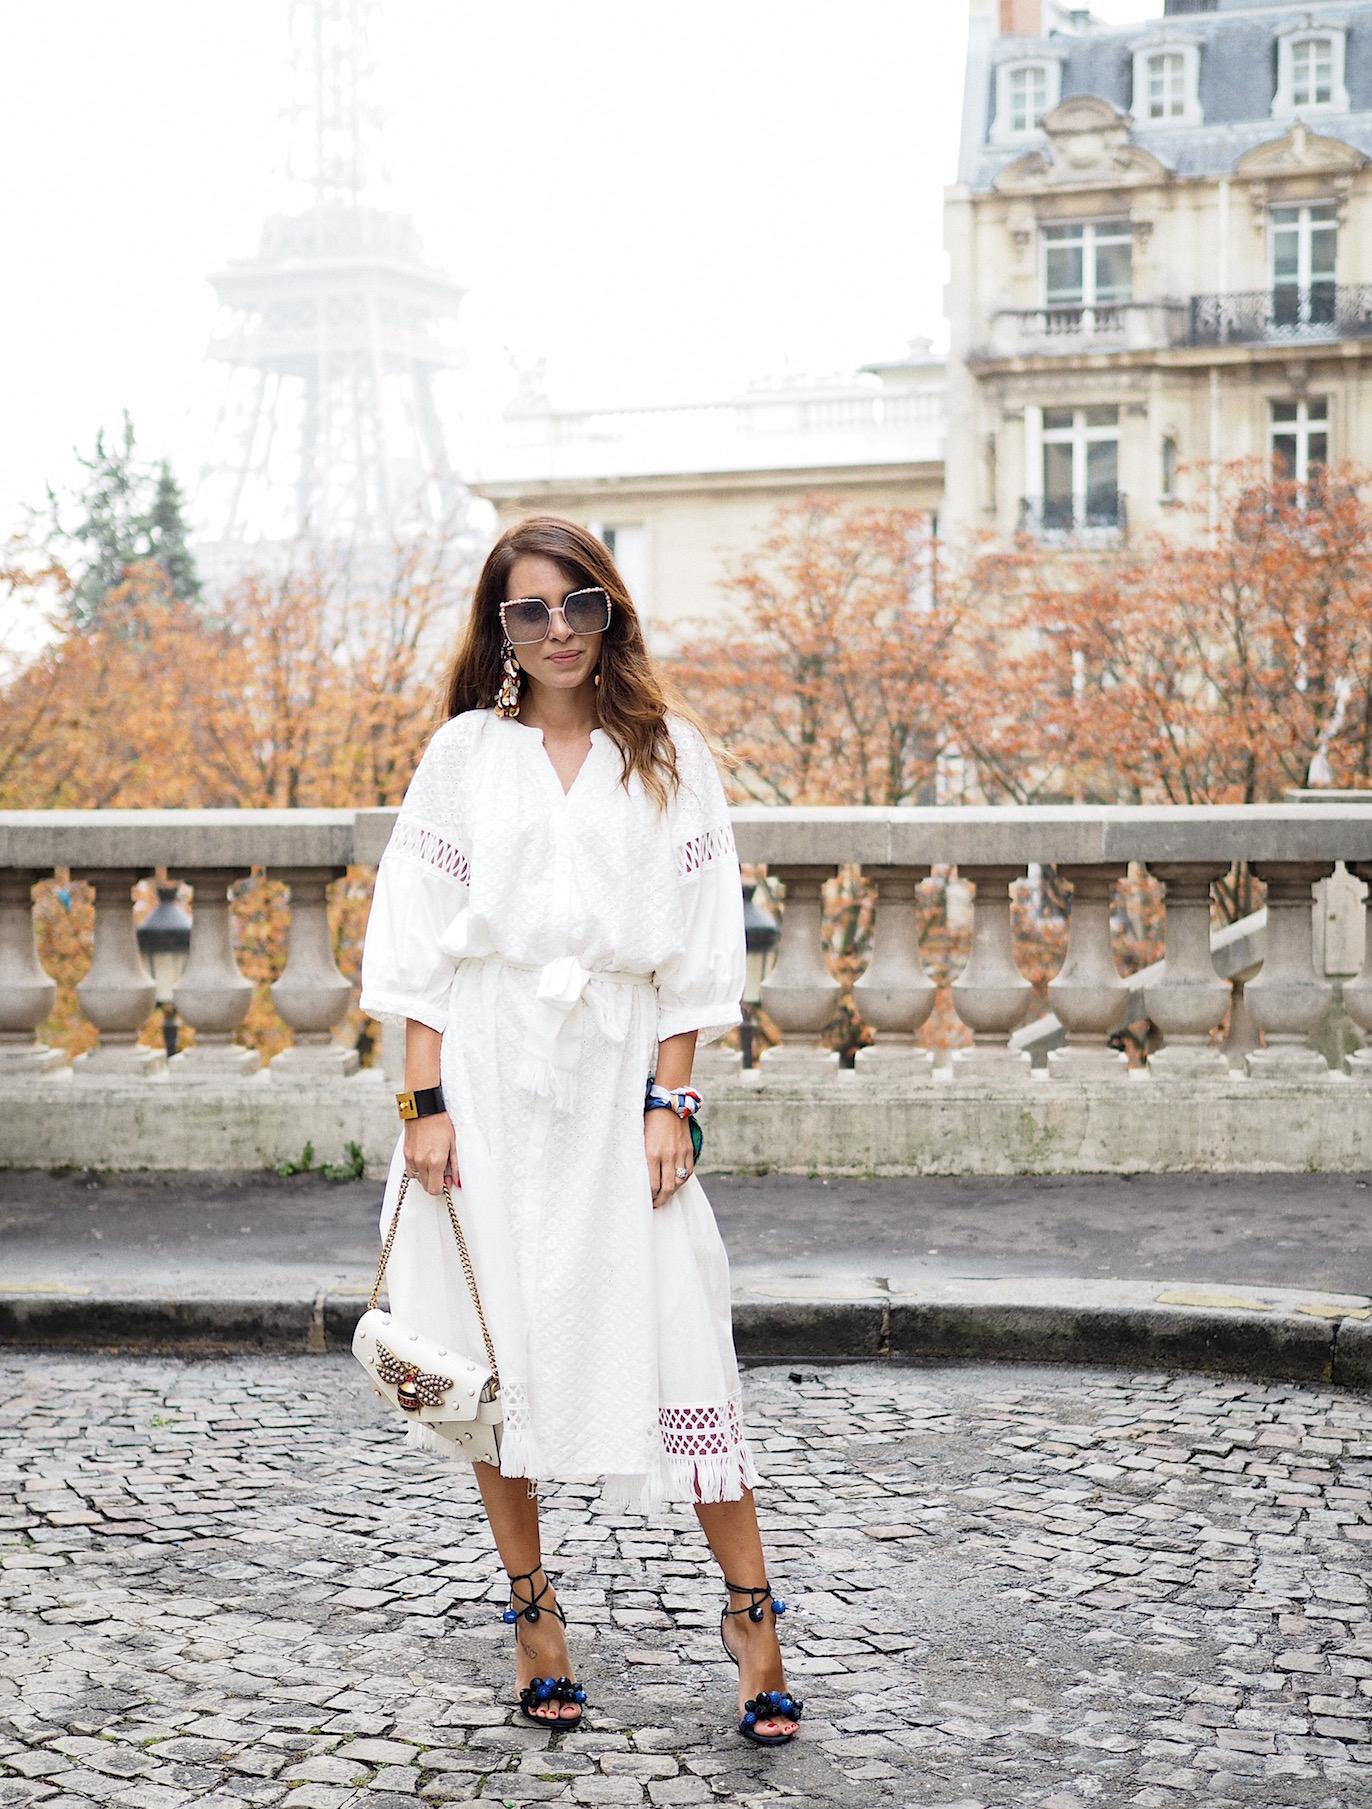 paris-fashion-week-street-style-storest-white-dress-gucci-bag-aquazzura-shoes